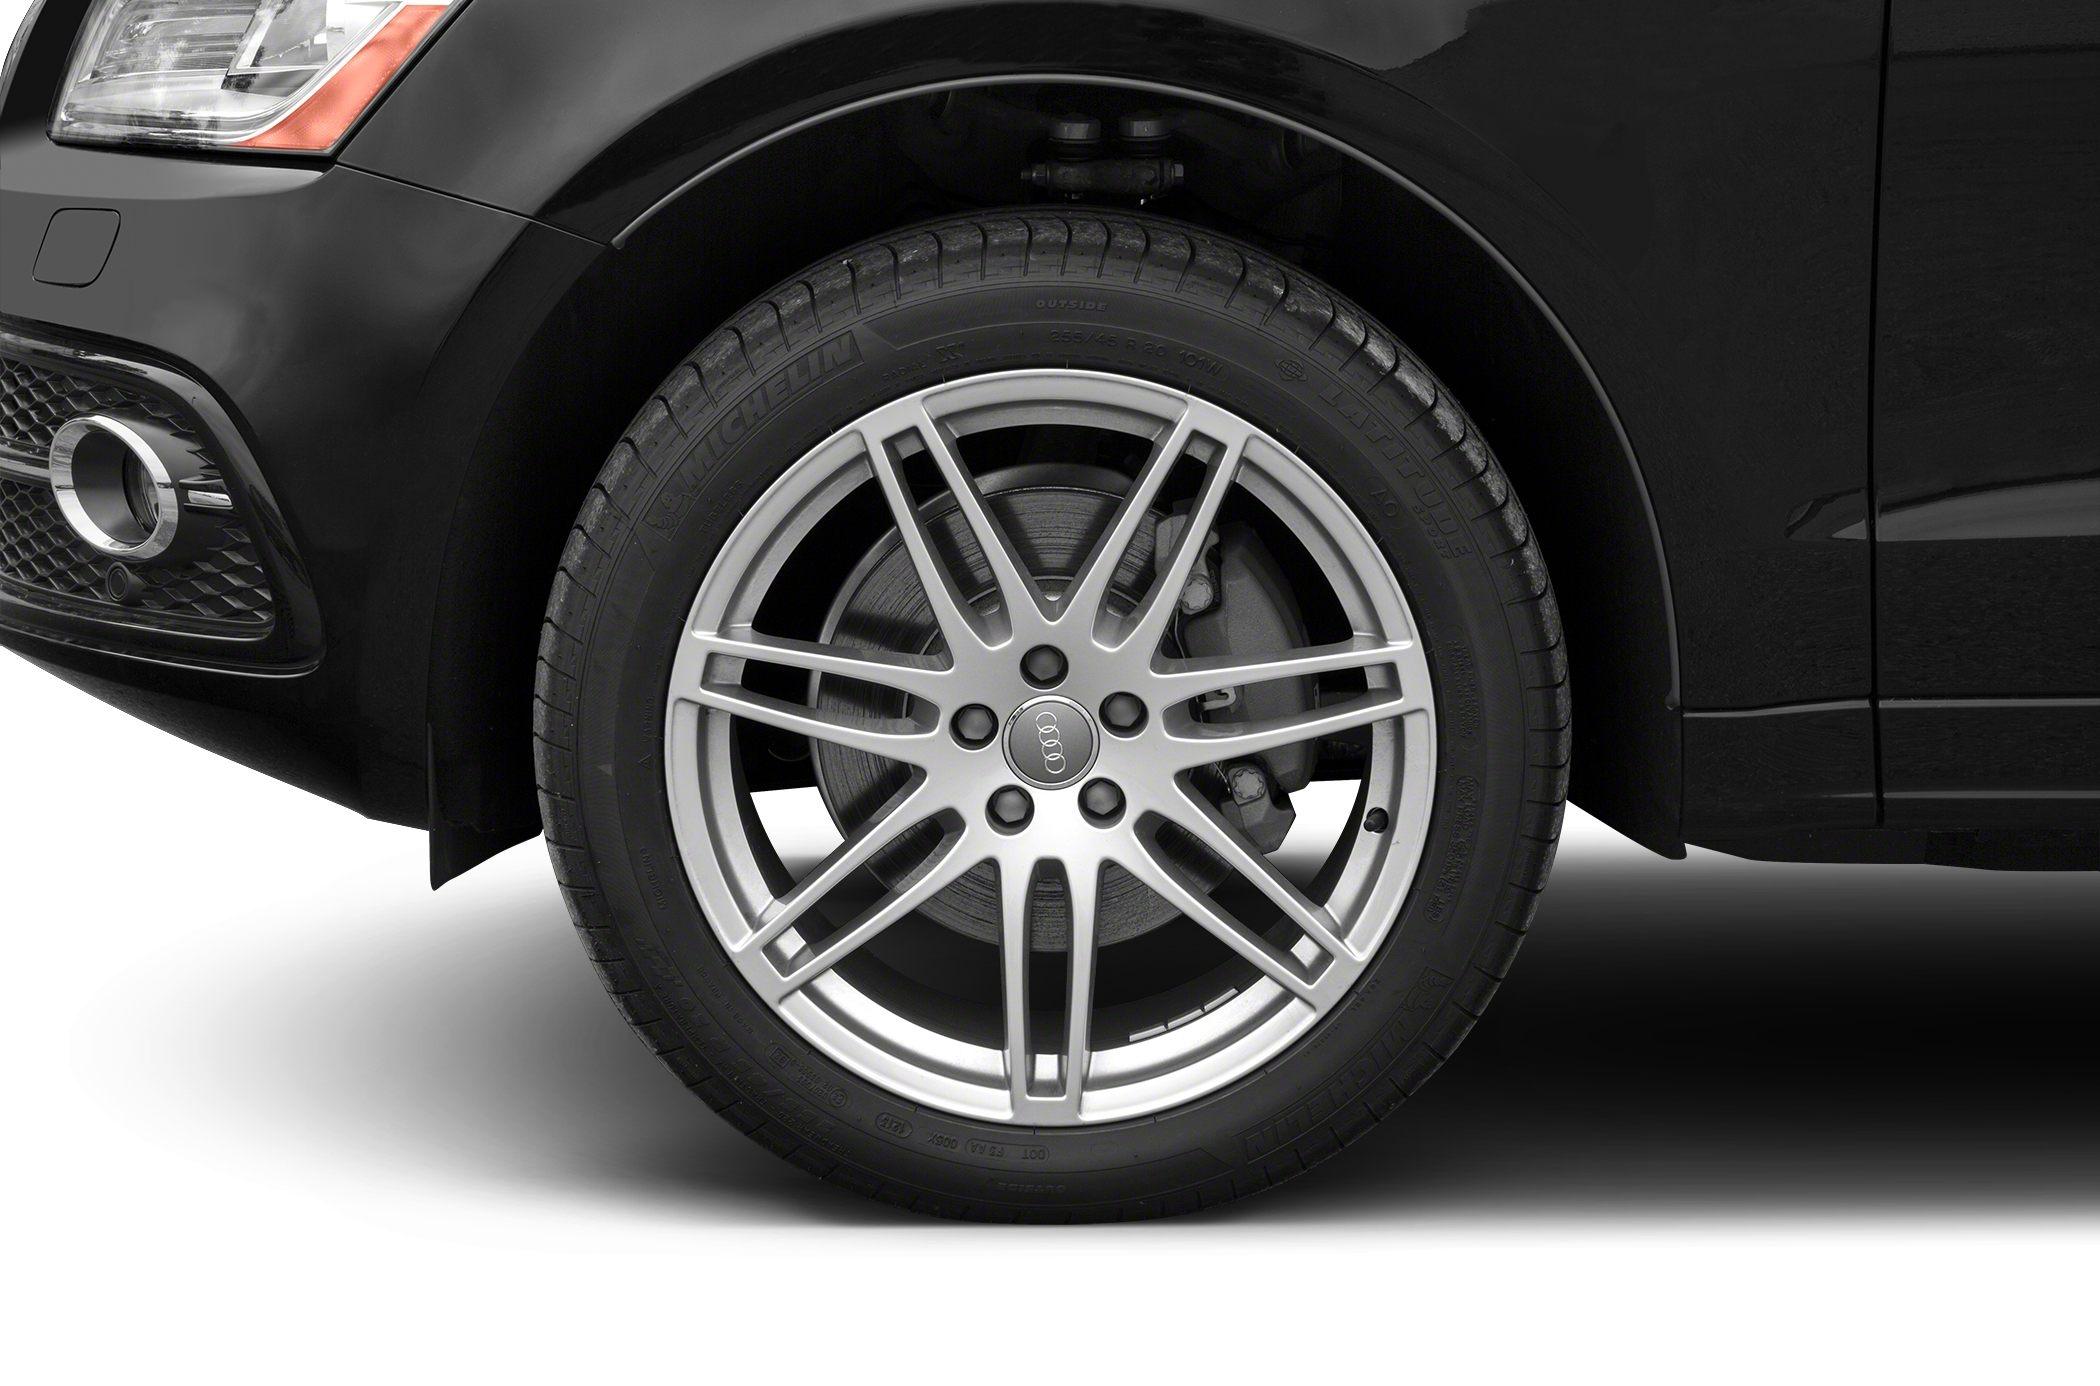 2015 audi q5 hybrid suv 20t prestige 4dr all wheel drive quattro sport utility photo 7 audi q5 invoice